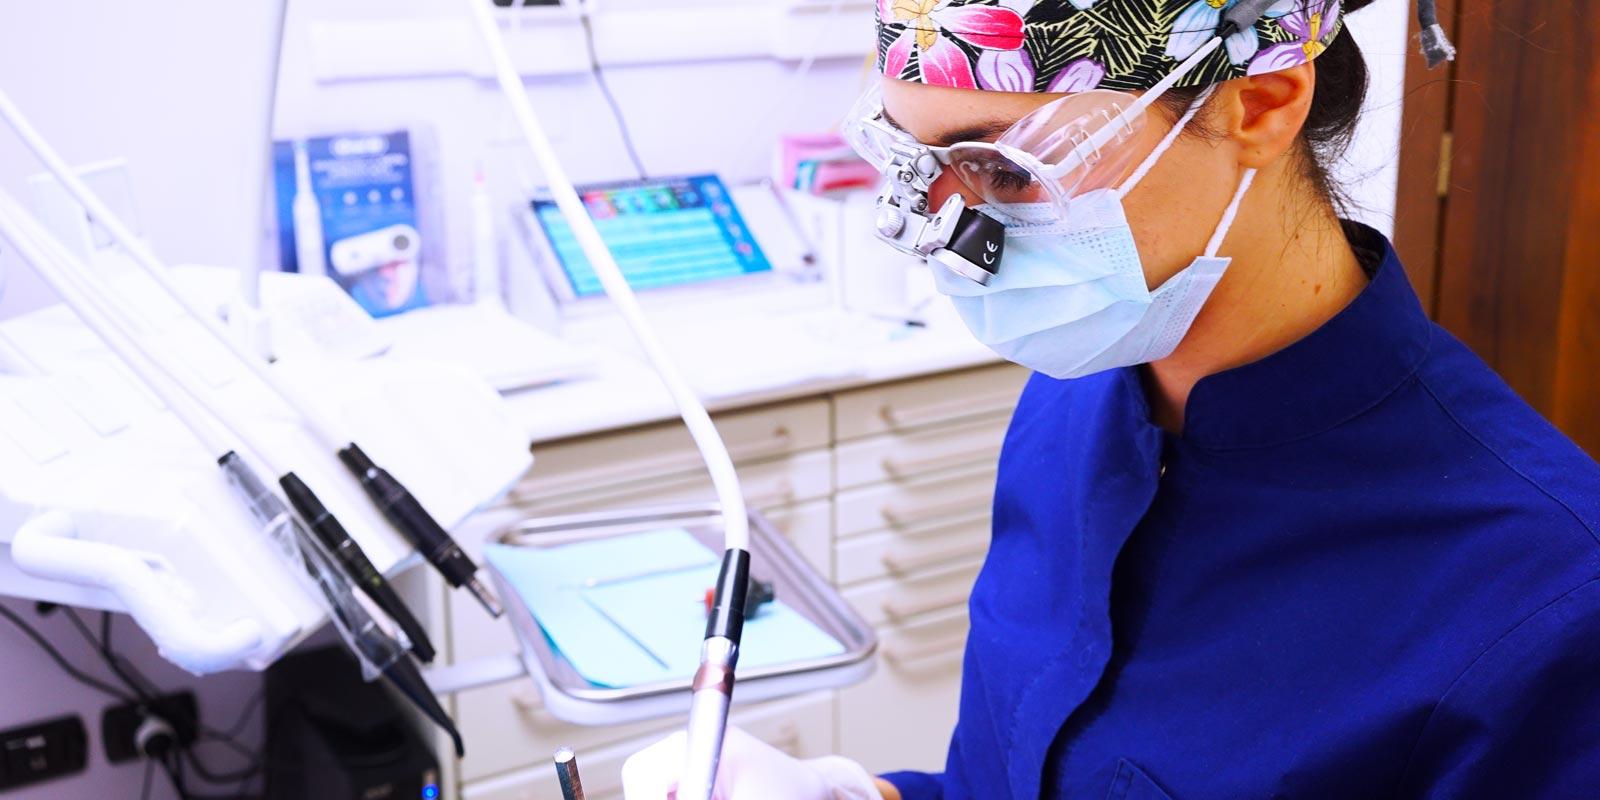 studio-dentistico-dottor-gola-casteggio-odontoiatria-pavia-dentista-implantologia-ortodonzia-protesi-chirurgia-86